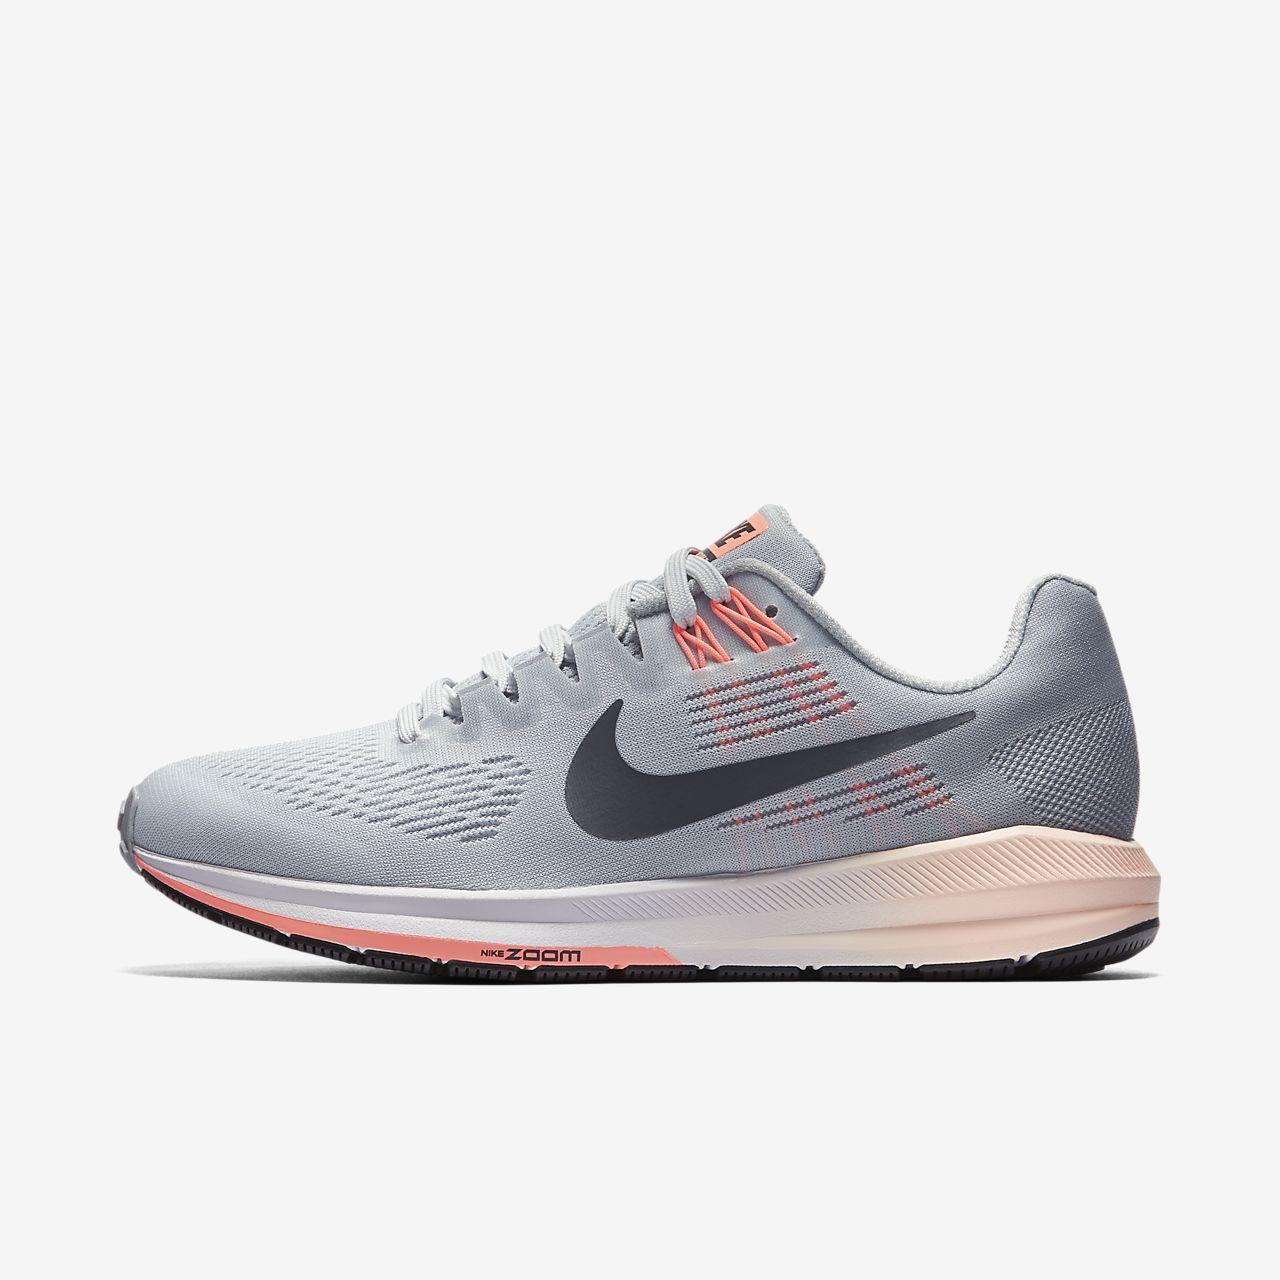 buy online bba31 012c4 Nike Air Zoom Structure 21 Damen-Laufschuh - 44a1e4 -  schlemme-zahntechnik.de